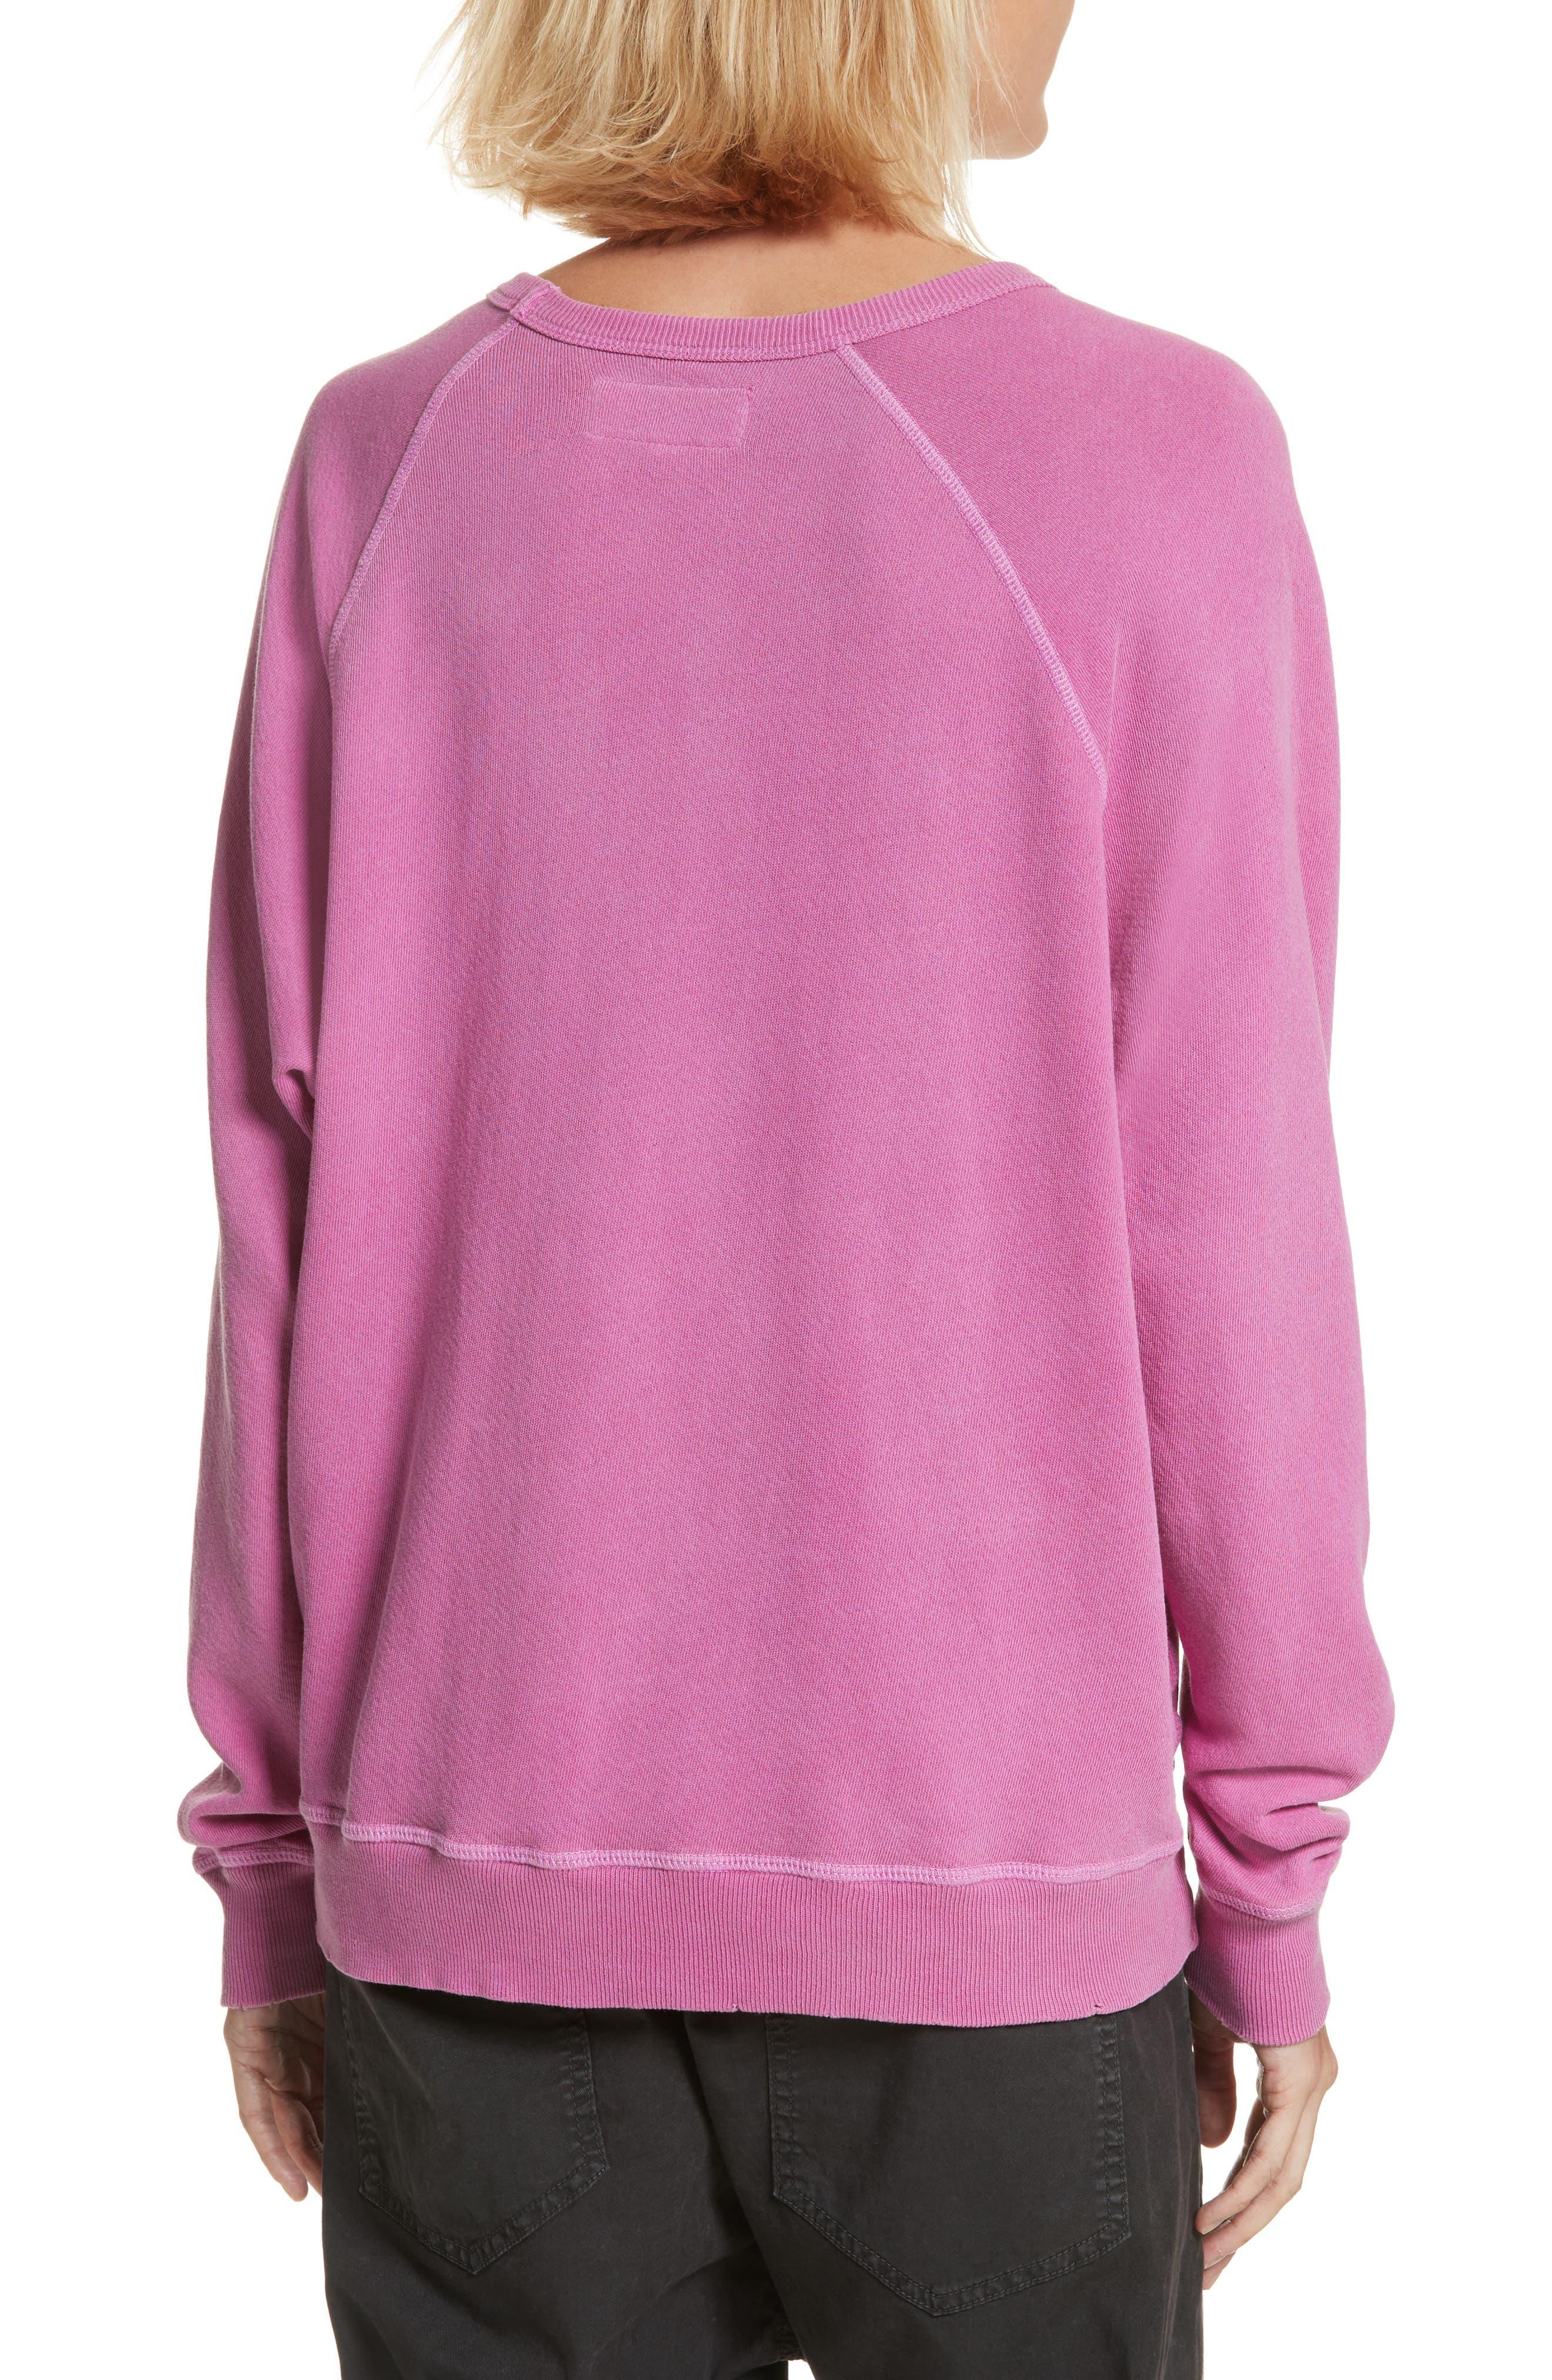 THE GREAT. The College Sweatshirt